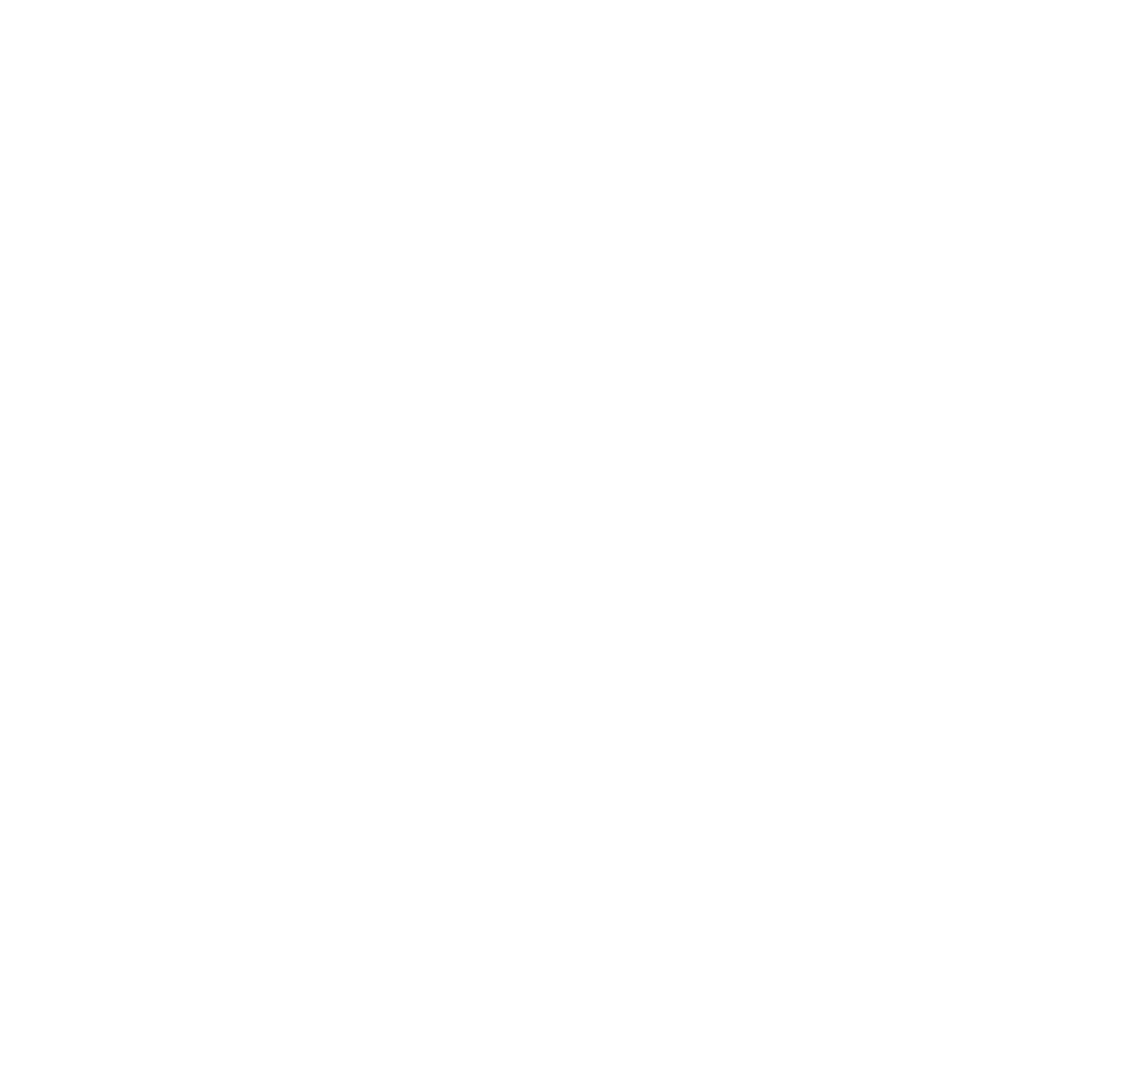 new up logo